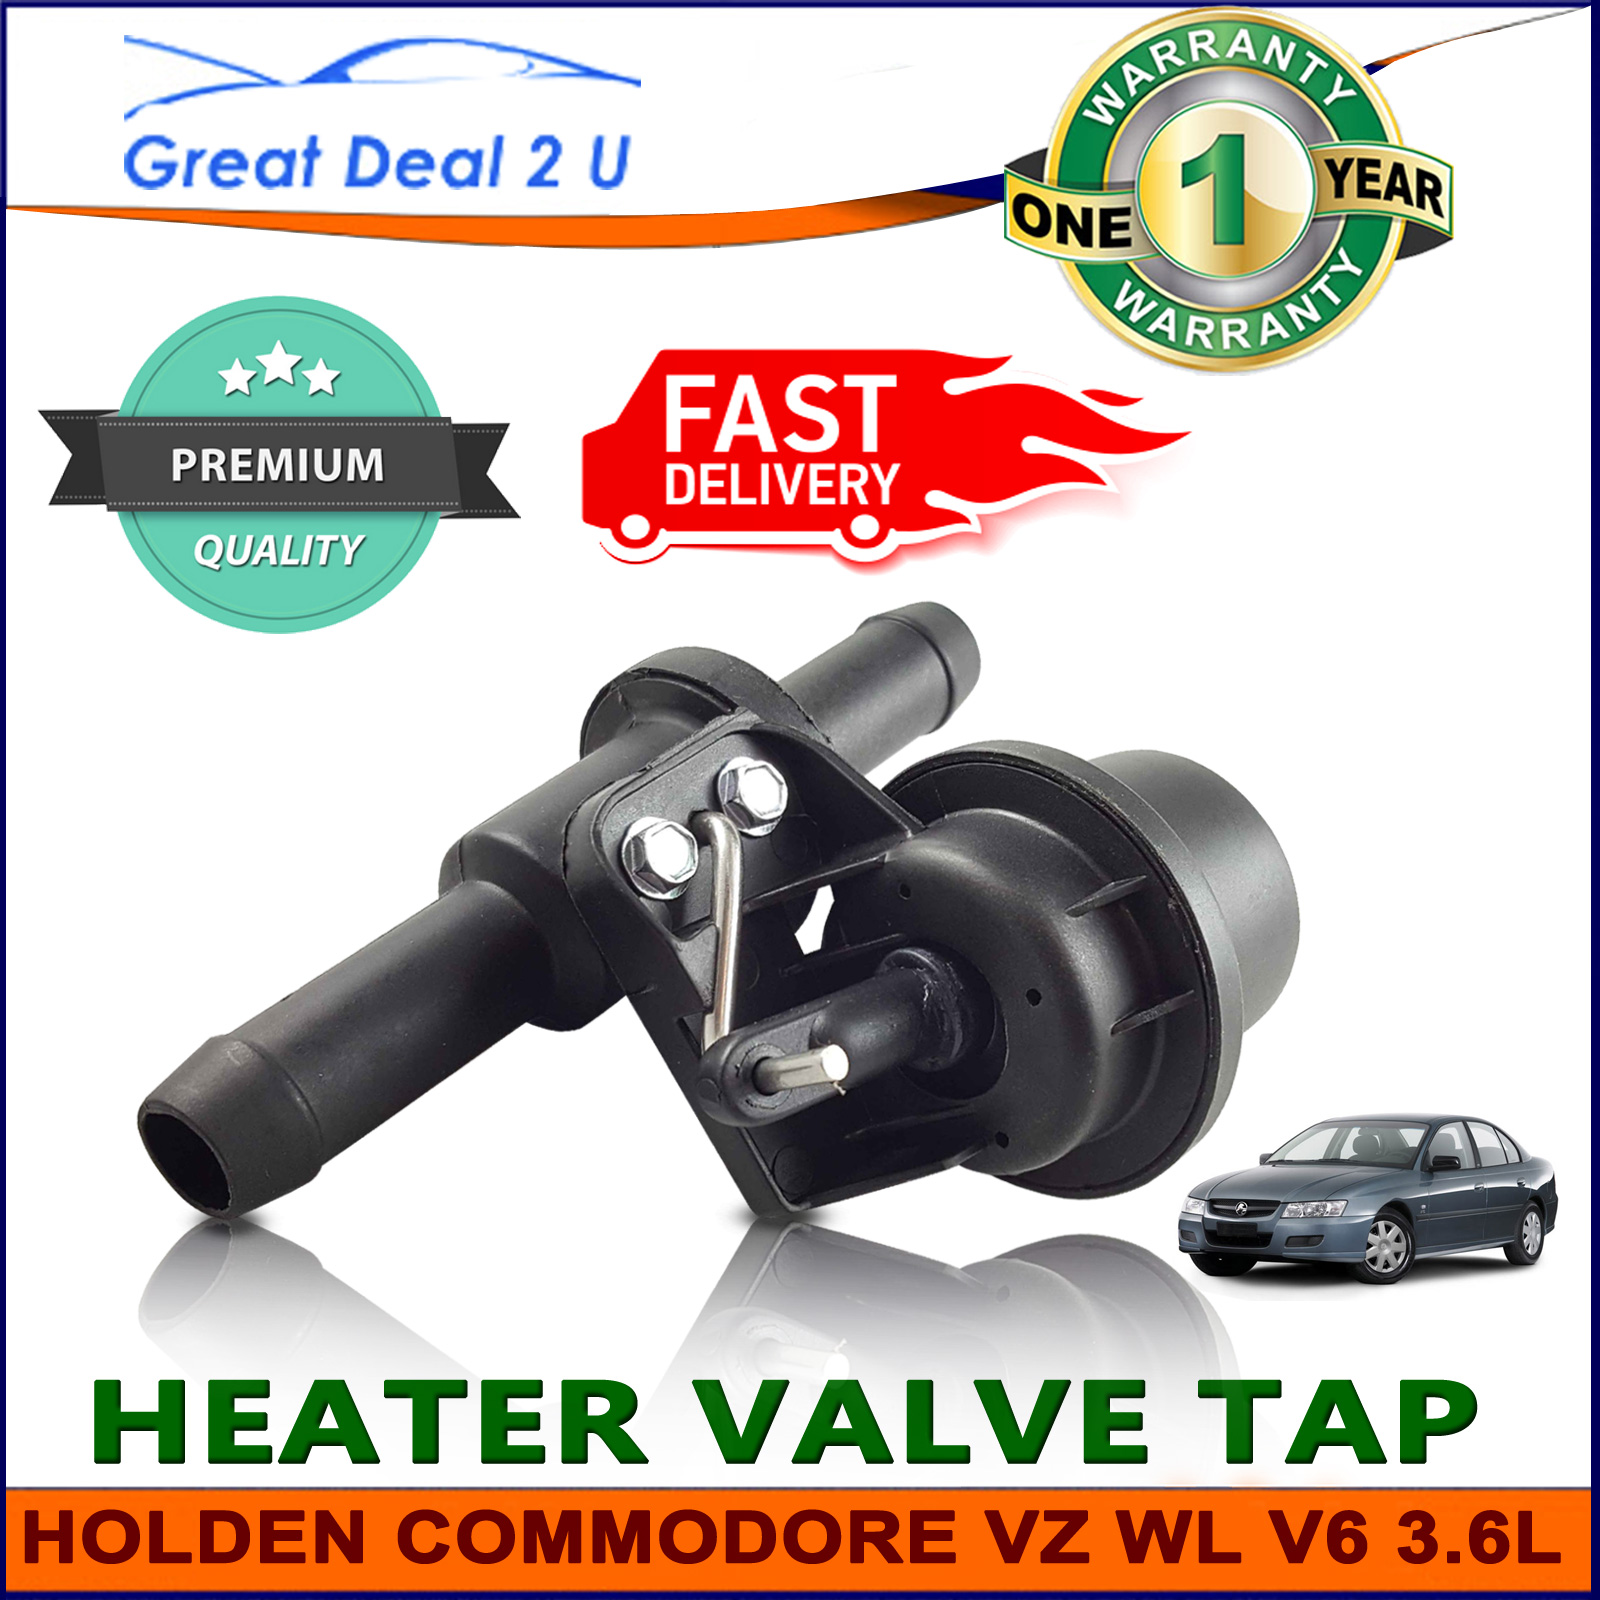 Holden heater valve tap commodore vz wl statesman one tonner heater valve tap holden commodore vz wl v6 36l crewman statesman hv2005 vanachro Gallery